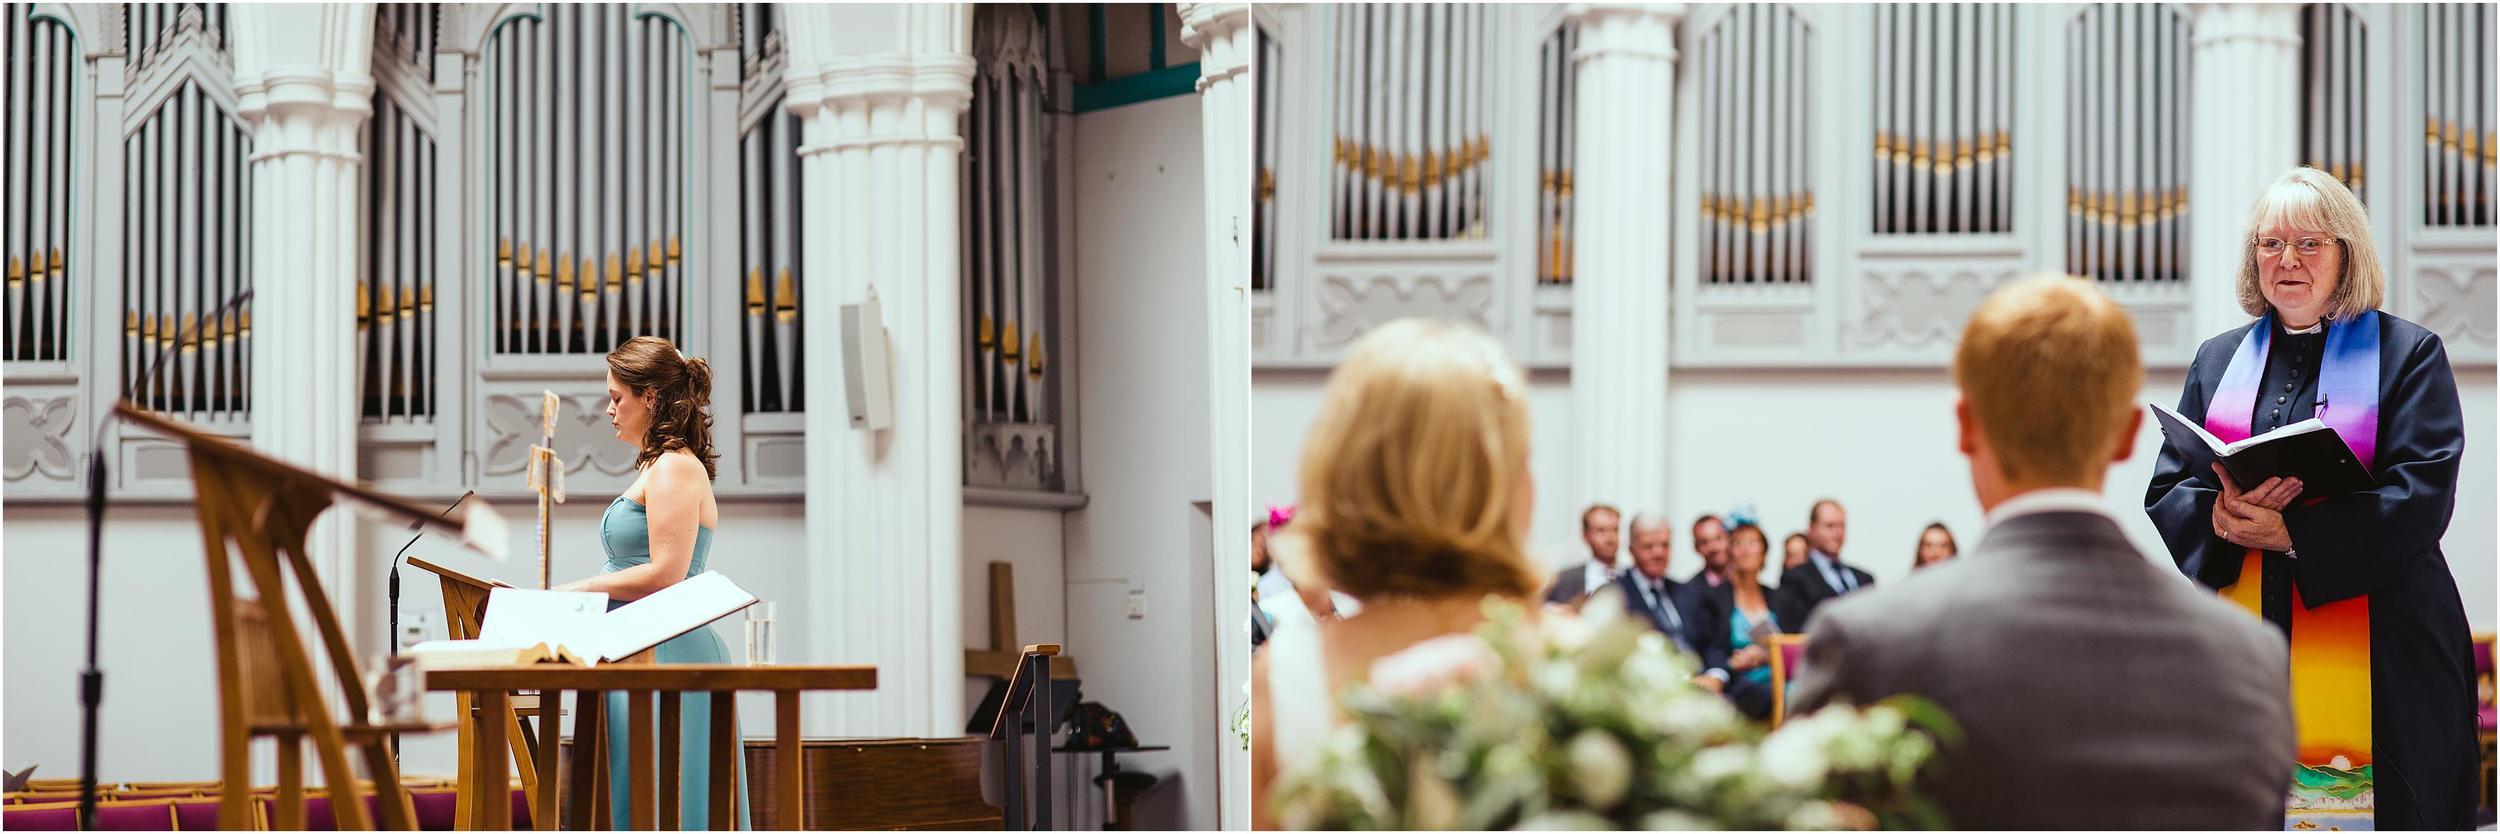 winchester wedding photographer_0021.jpg